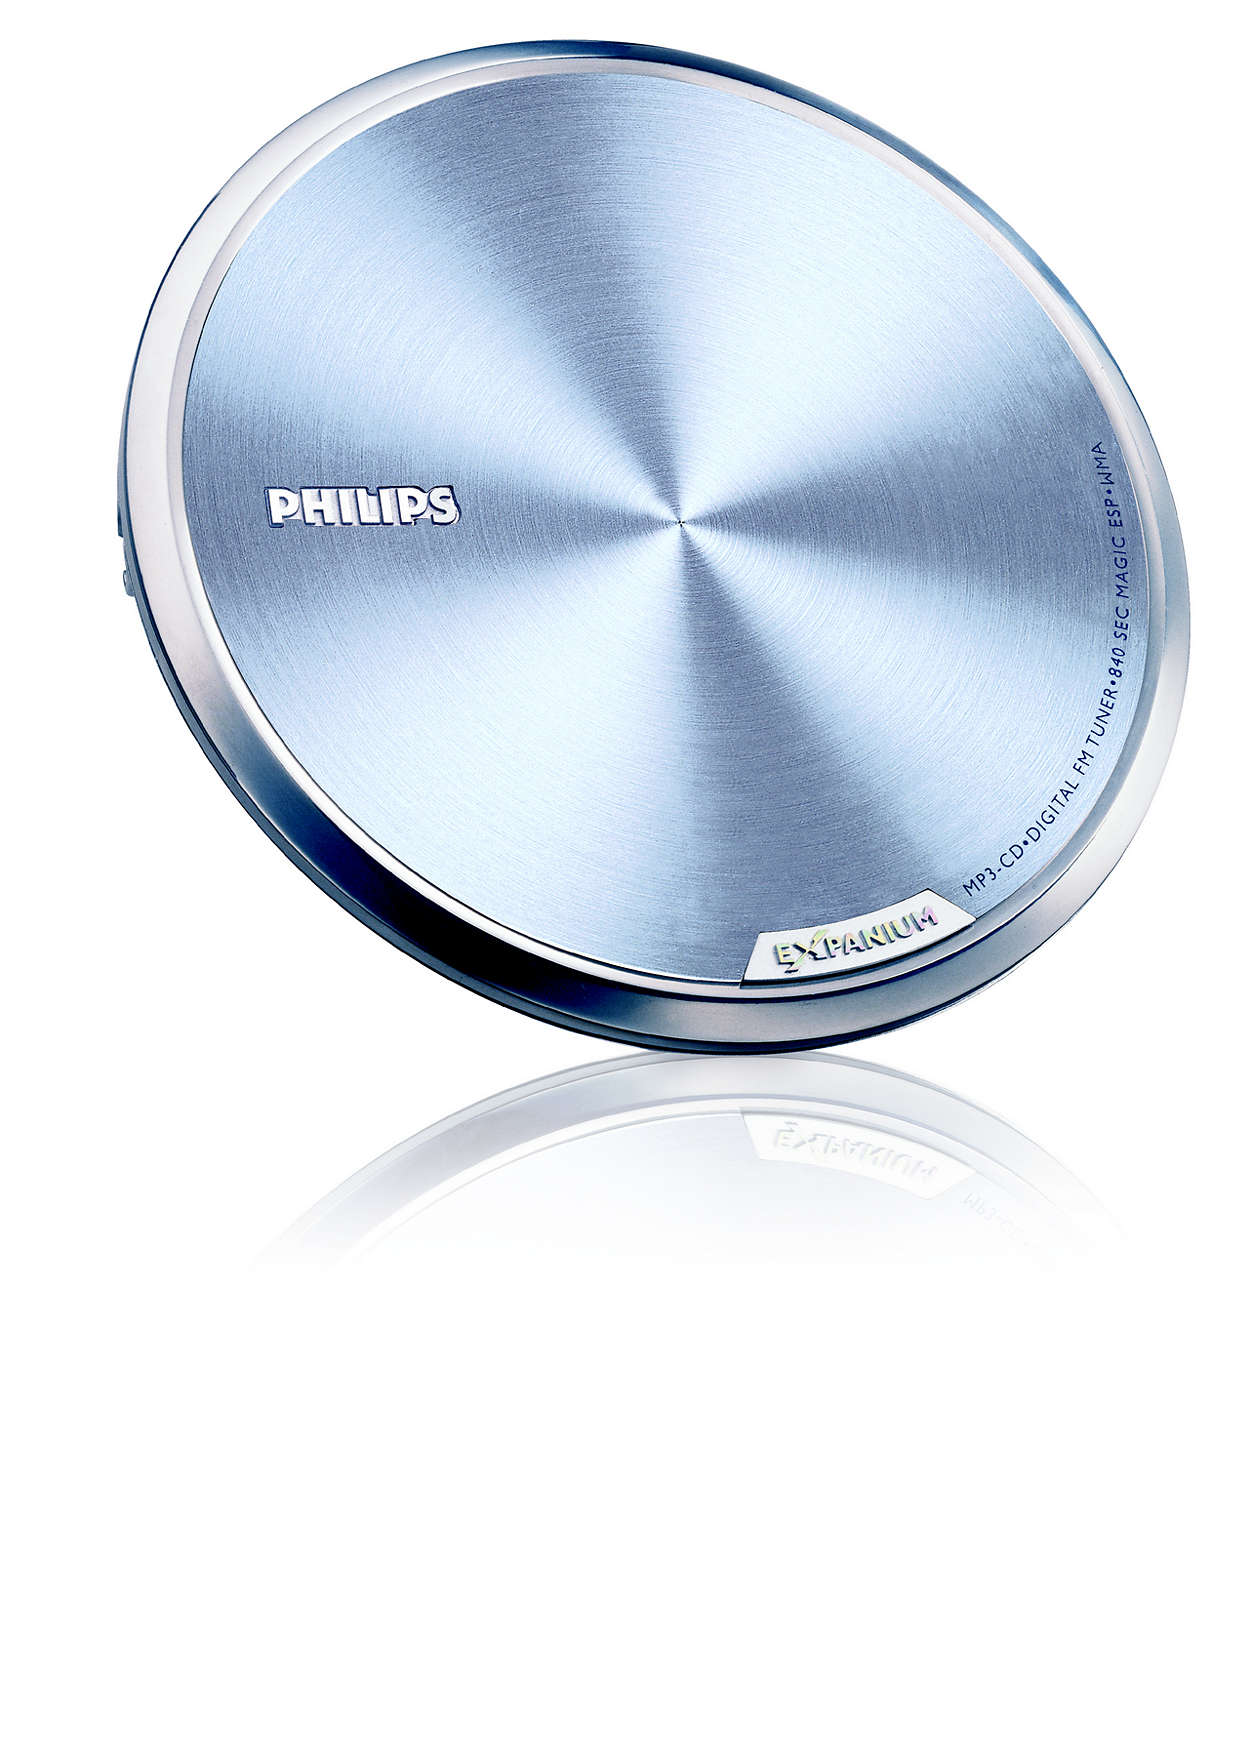 Super slim and ultra lite MP3-CD player